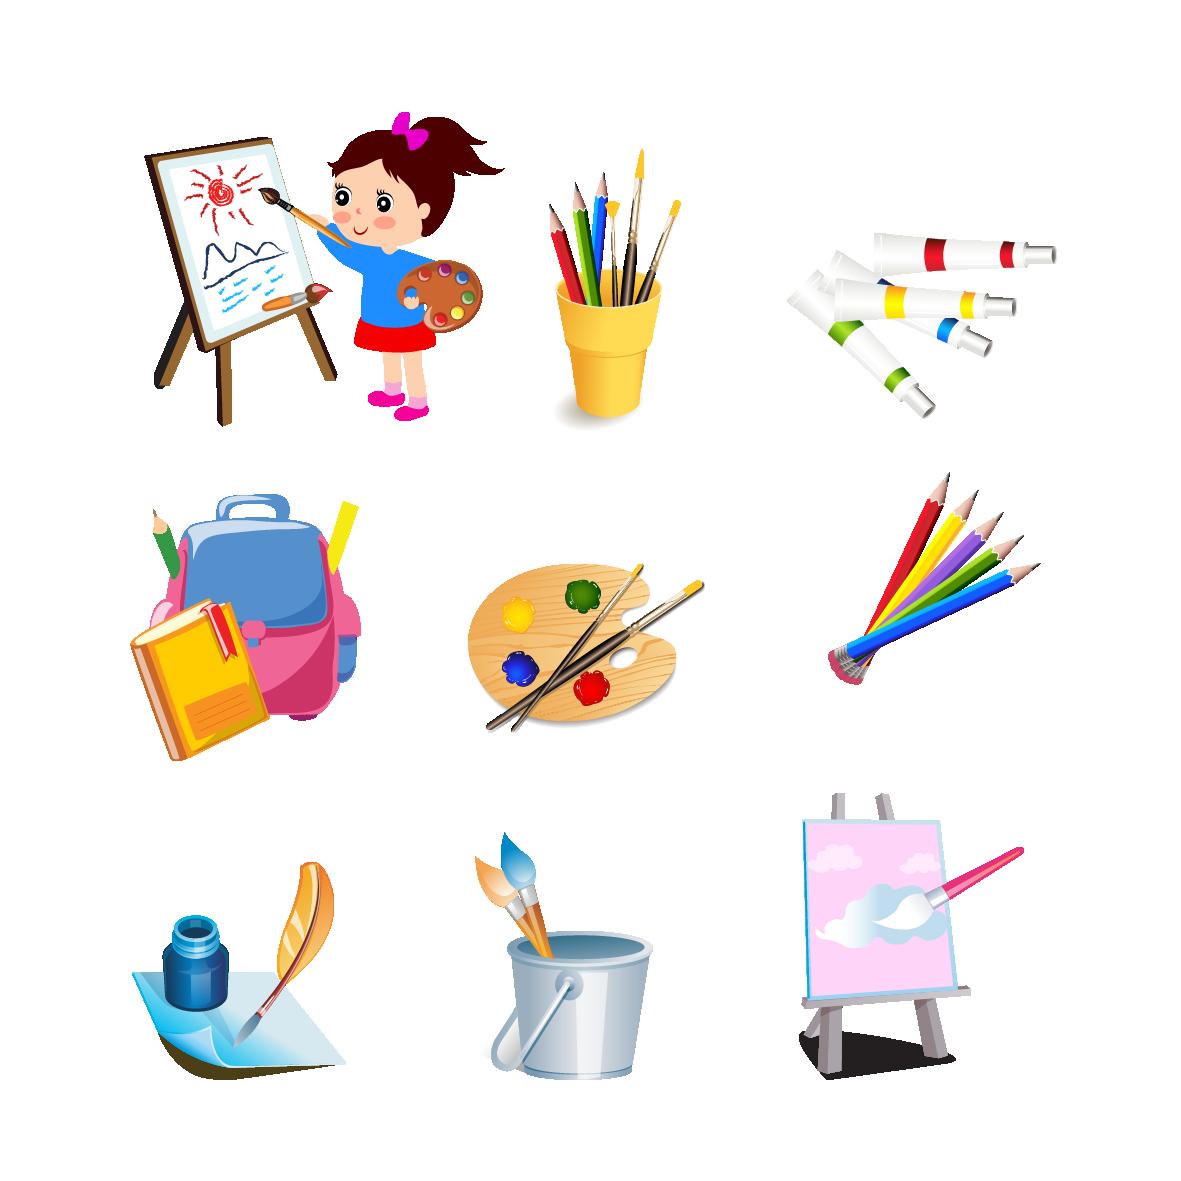 School tools clipart clip transparent stock Tools Clip Art Drawing at GetDrawings.com | Free for personal use ... clip transparent stock